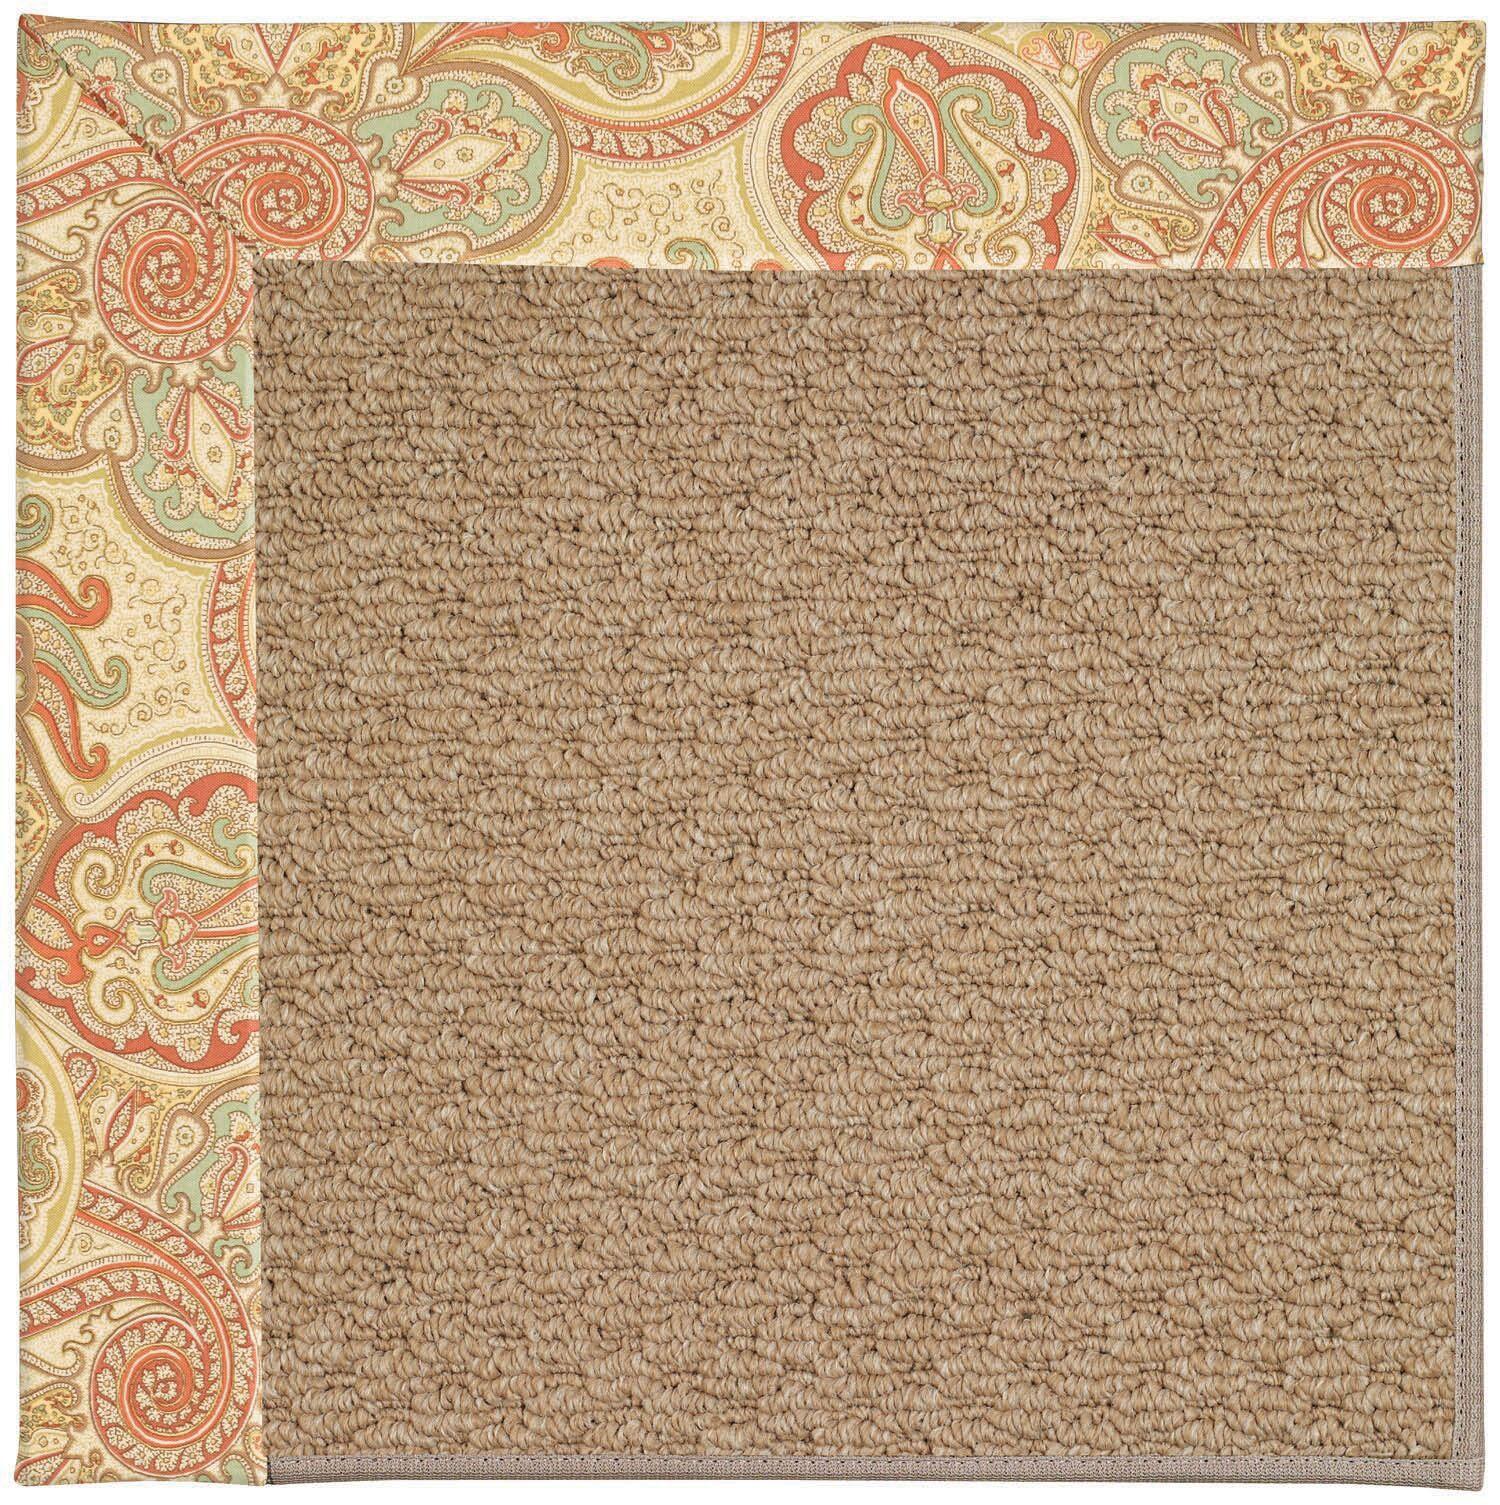 Lisle Machine Tufted Auburn/Brown Indoor/Outdoor Area Rug Rug Size: Square 6'